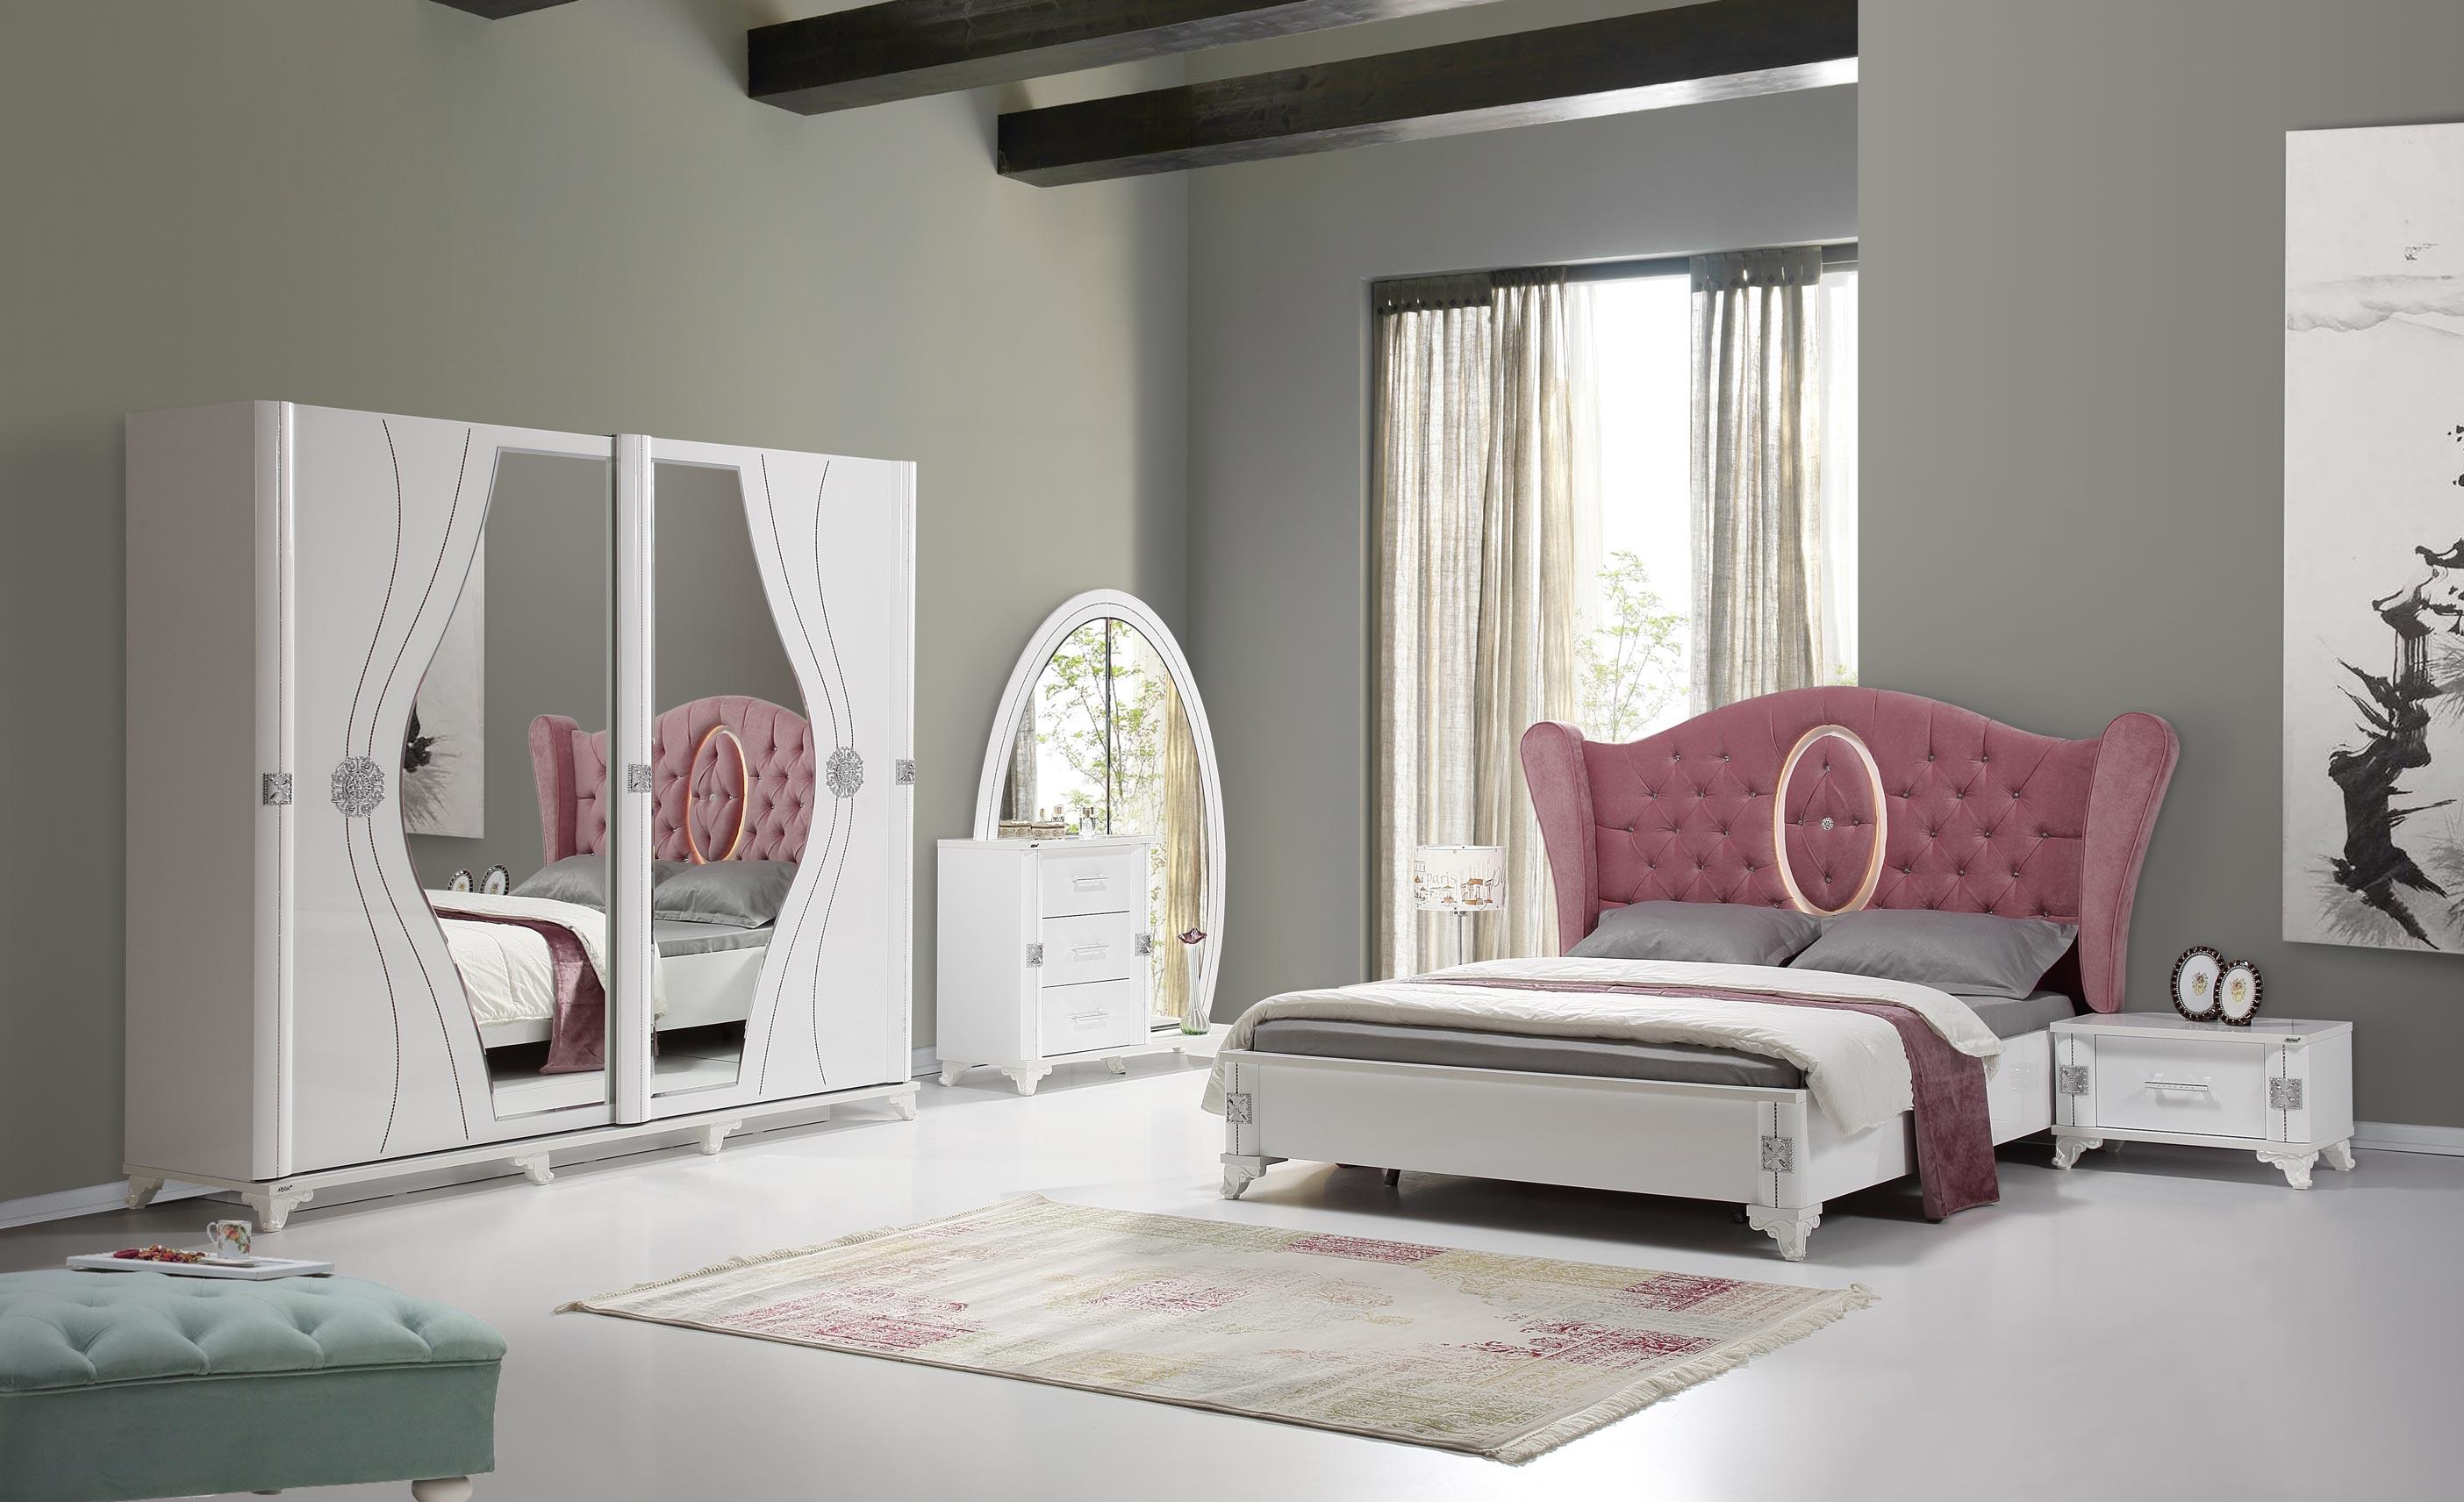 mehtap schlafzimmer yuvam m belhaus in wuppertal cilek offizieller h ndler in europa. Black Bedroom Furniture Sets. Home Design Ideas